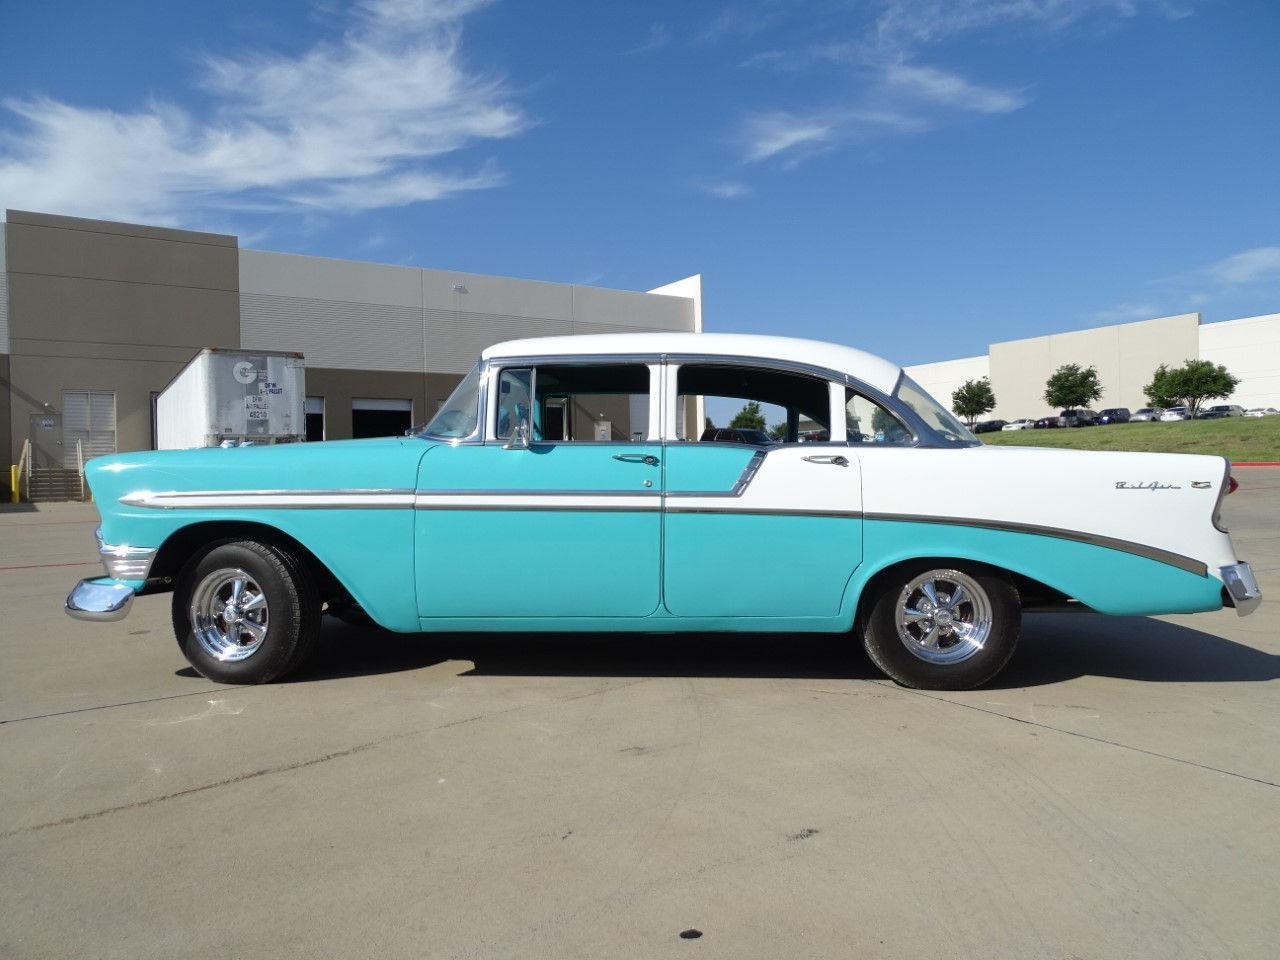 1956 Chevrolet Bel Air (CC-1375394) for sale in O'Fallon, Illinois